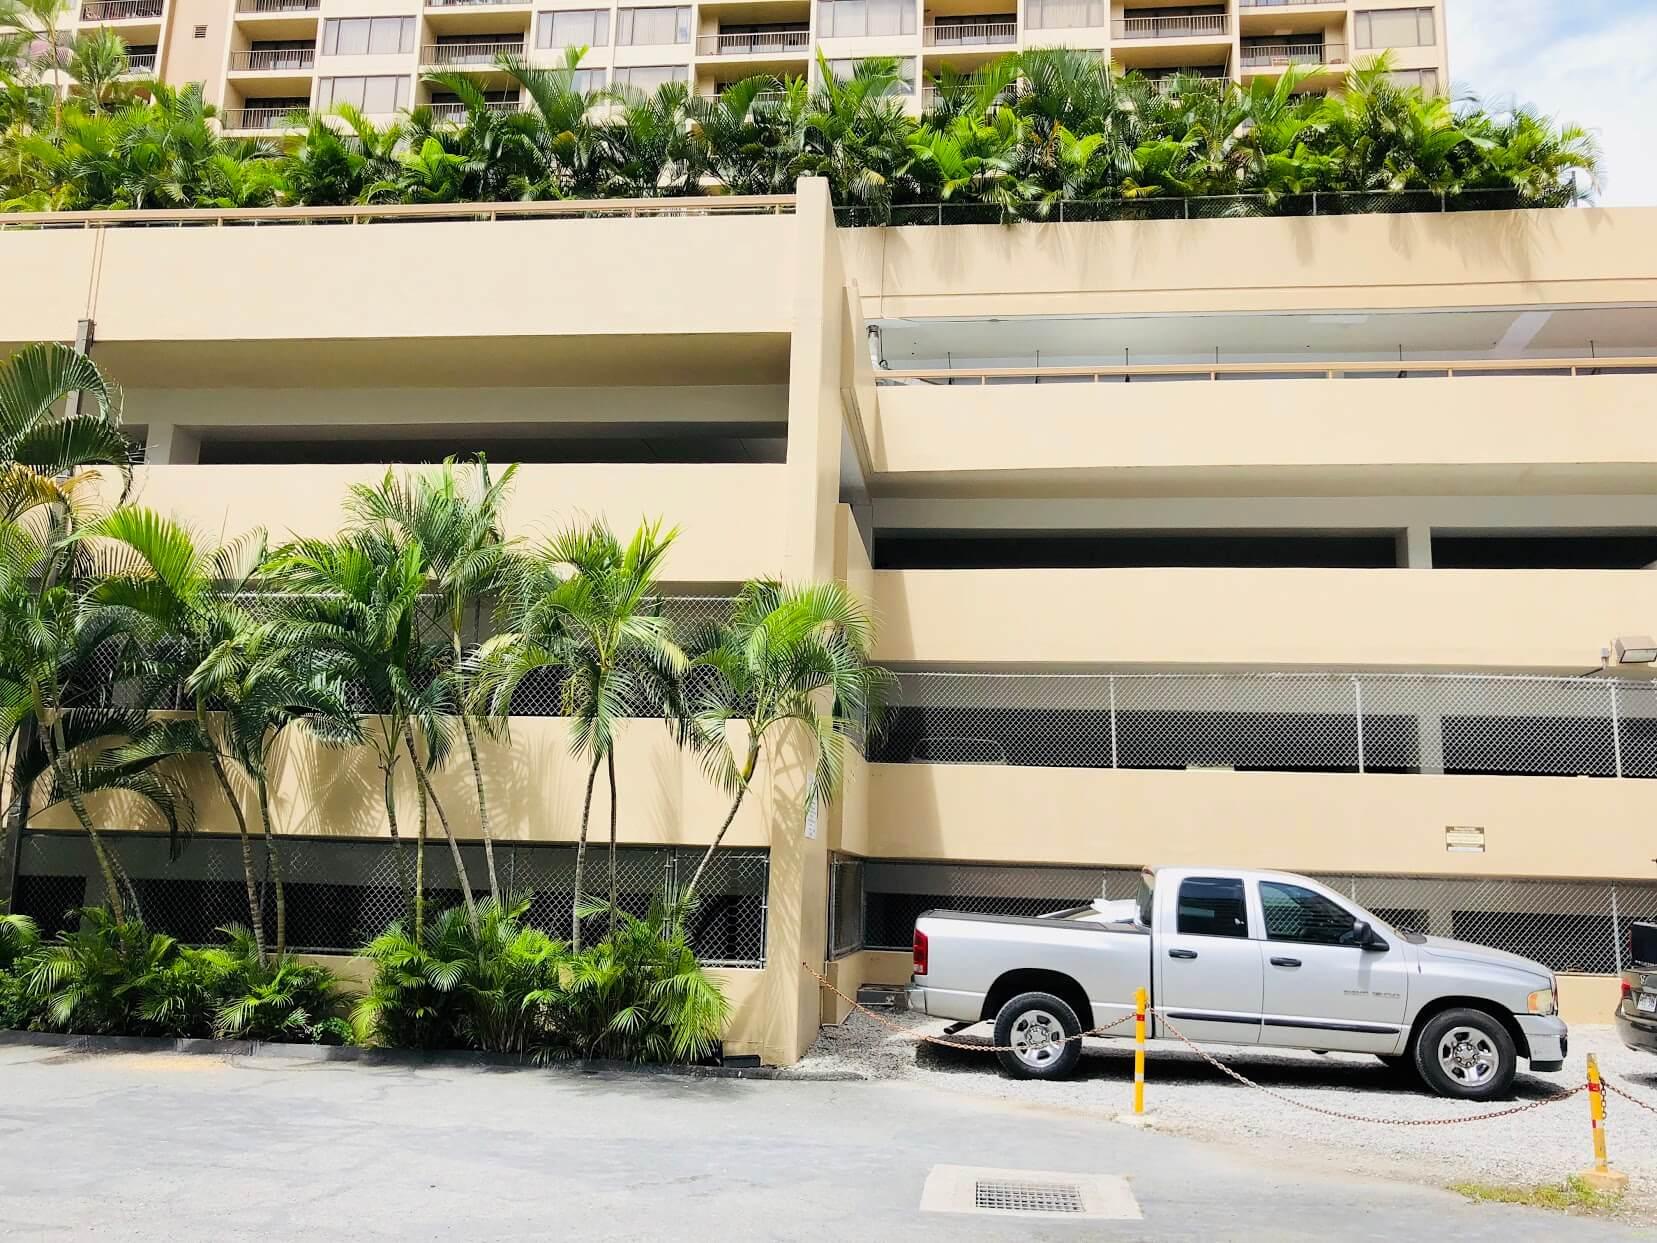 Chateau Waikikiの駐車場